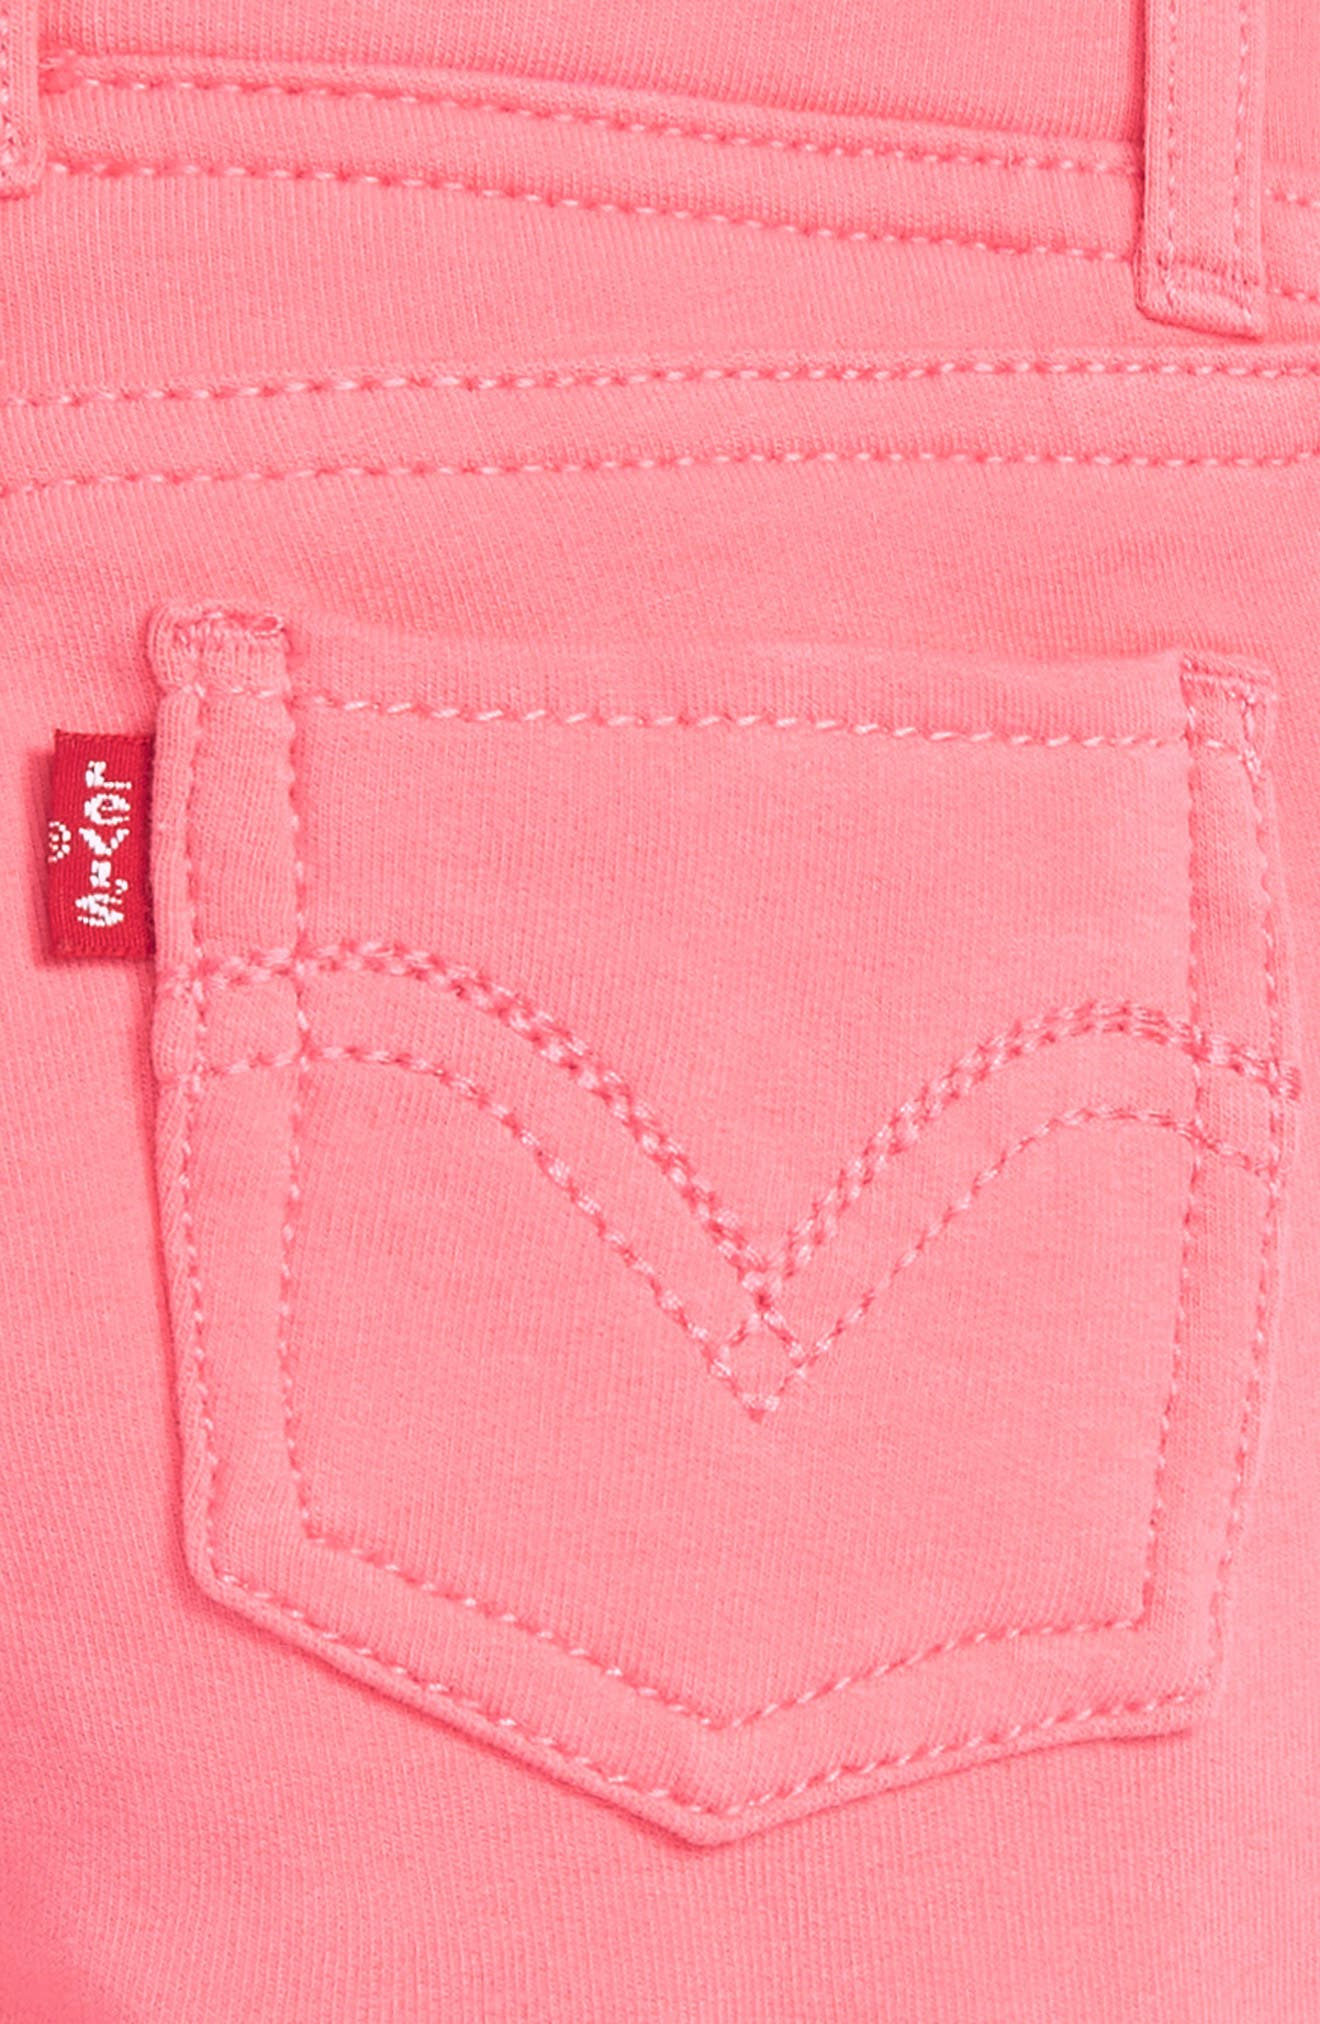 Haley May Leggings,                             Alternate thumbnail 3, color,                             Strawberry Pink